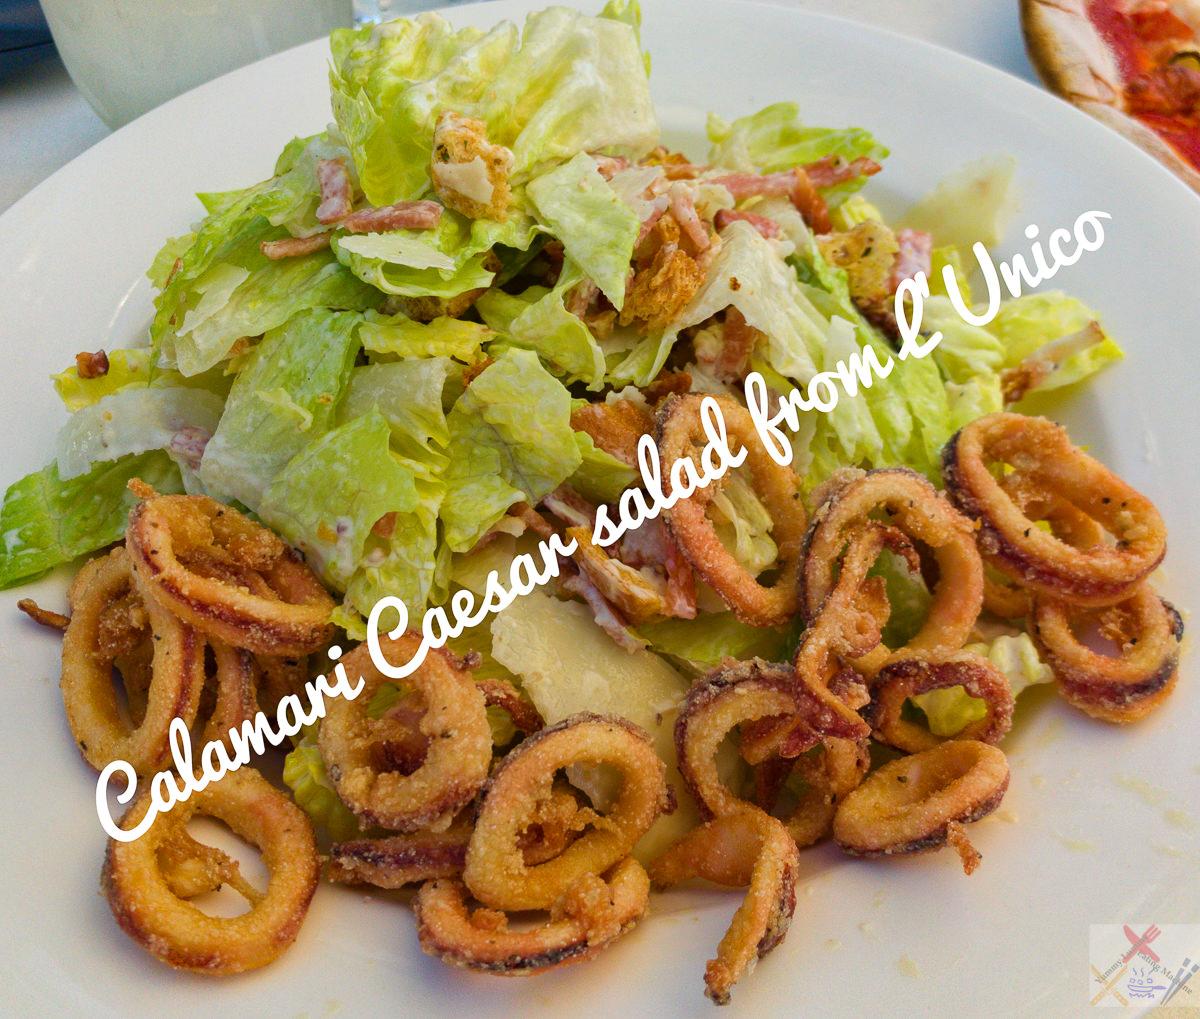 Calamari Caesar Salad from L'Unico, Trinity Bay Gary Lum